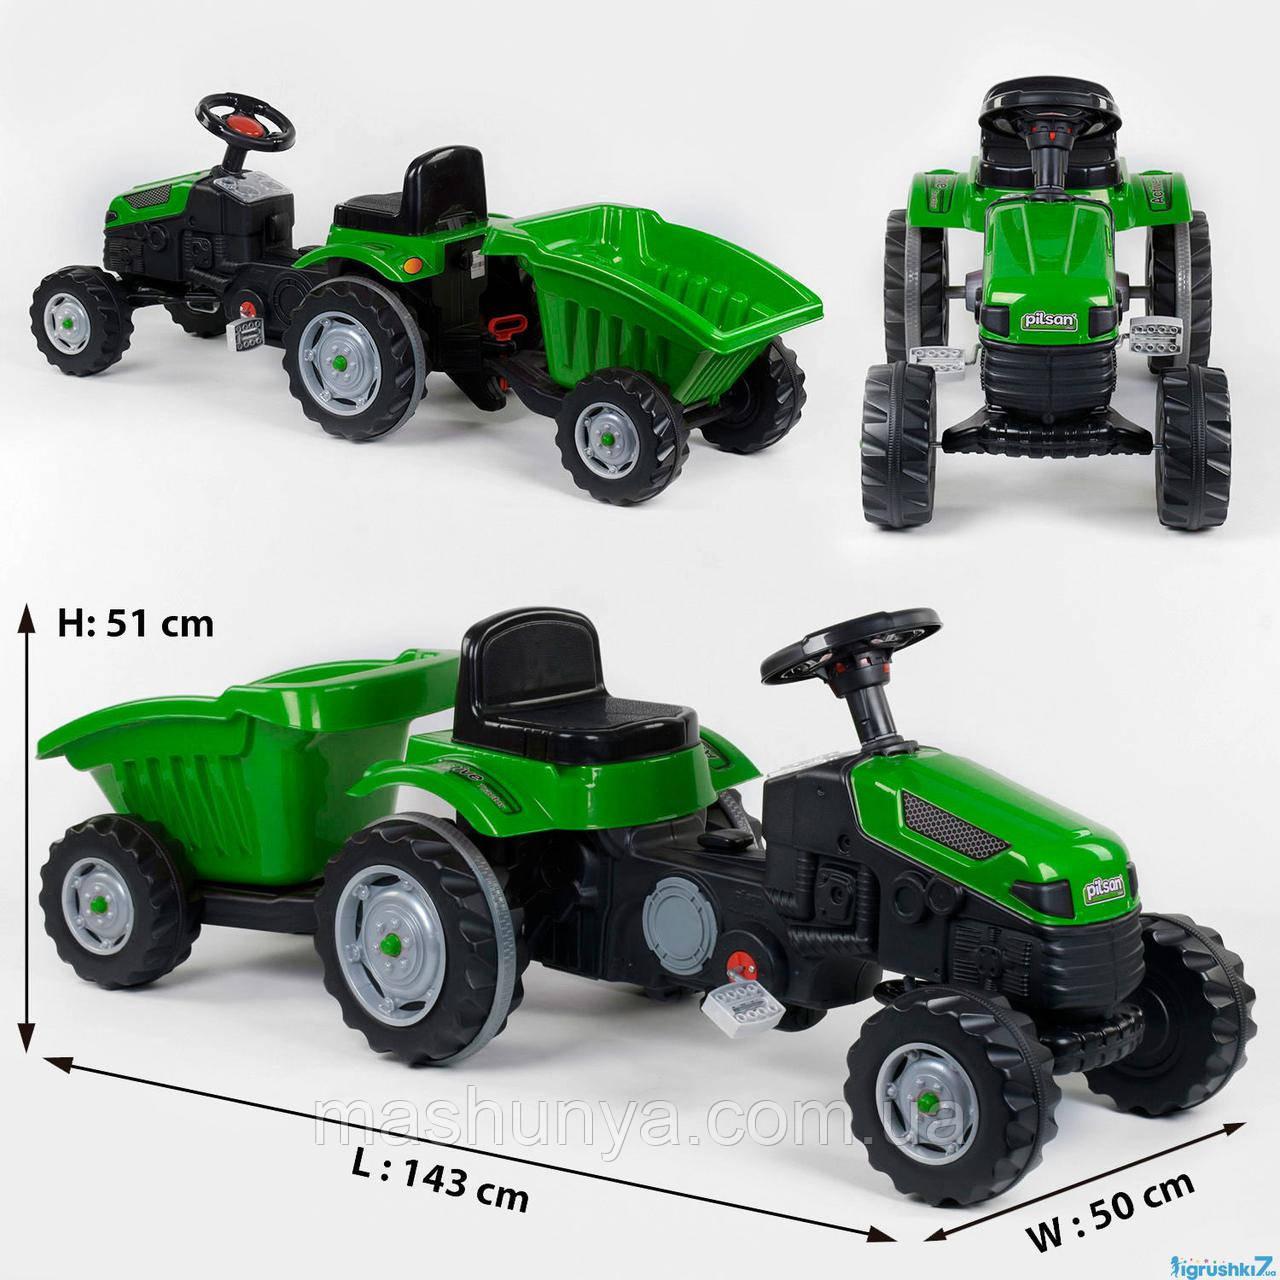 Трактор дитячий педальний Pilsan 07-316 з причепом